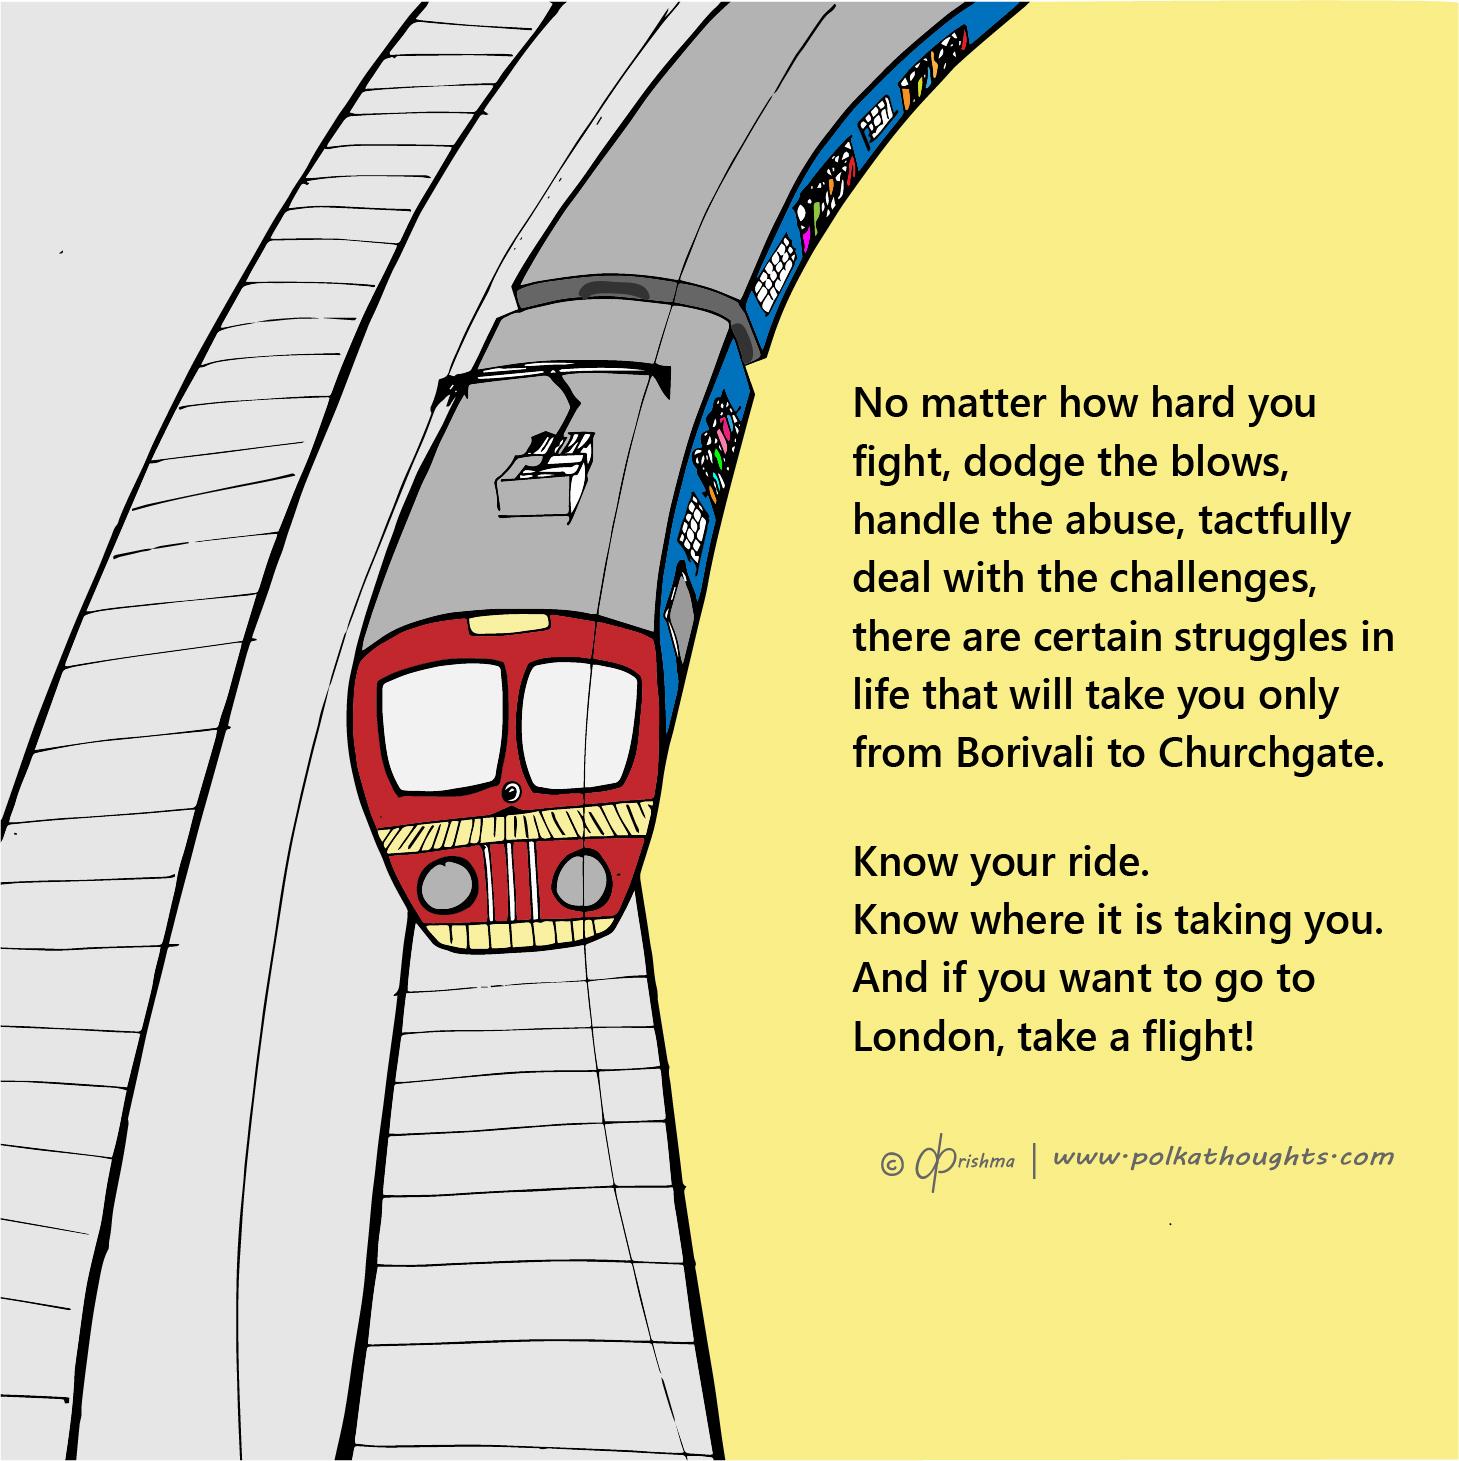 Mumbai local trains struggles